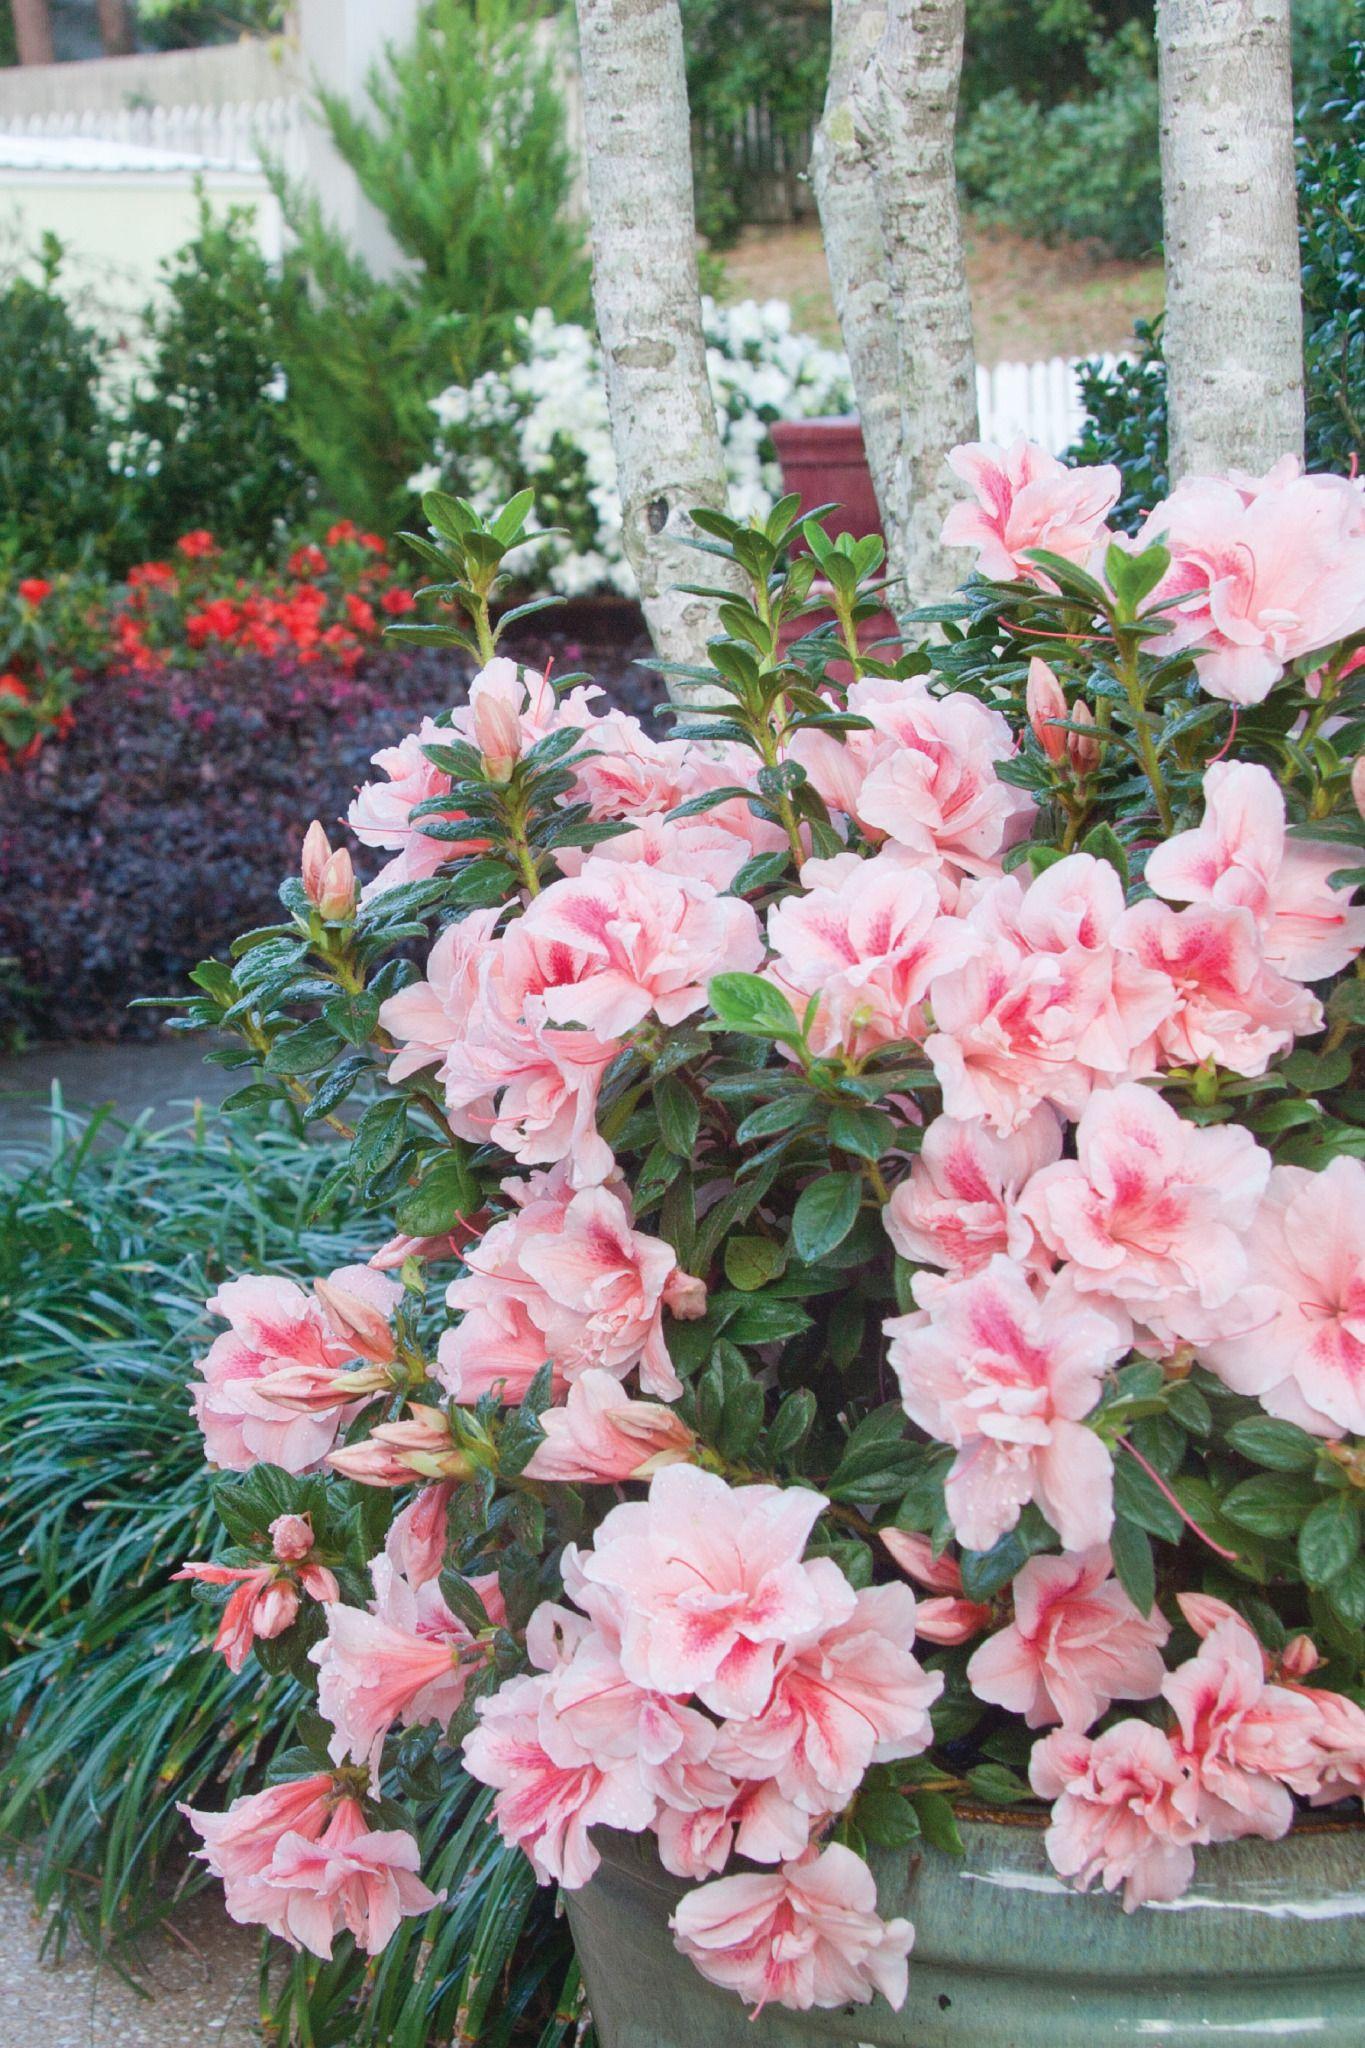 10 Best Uses For Encore Azaleas By Size Azaleas Landscaping Azaleas Garden Azaleas